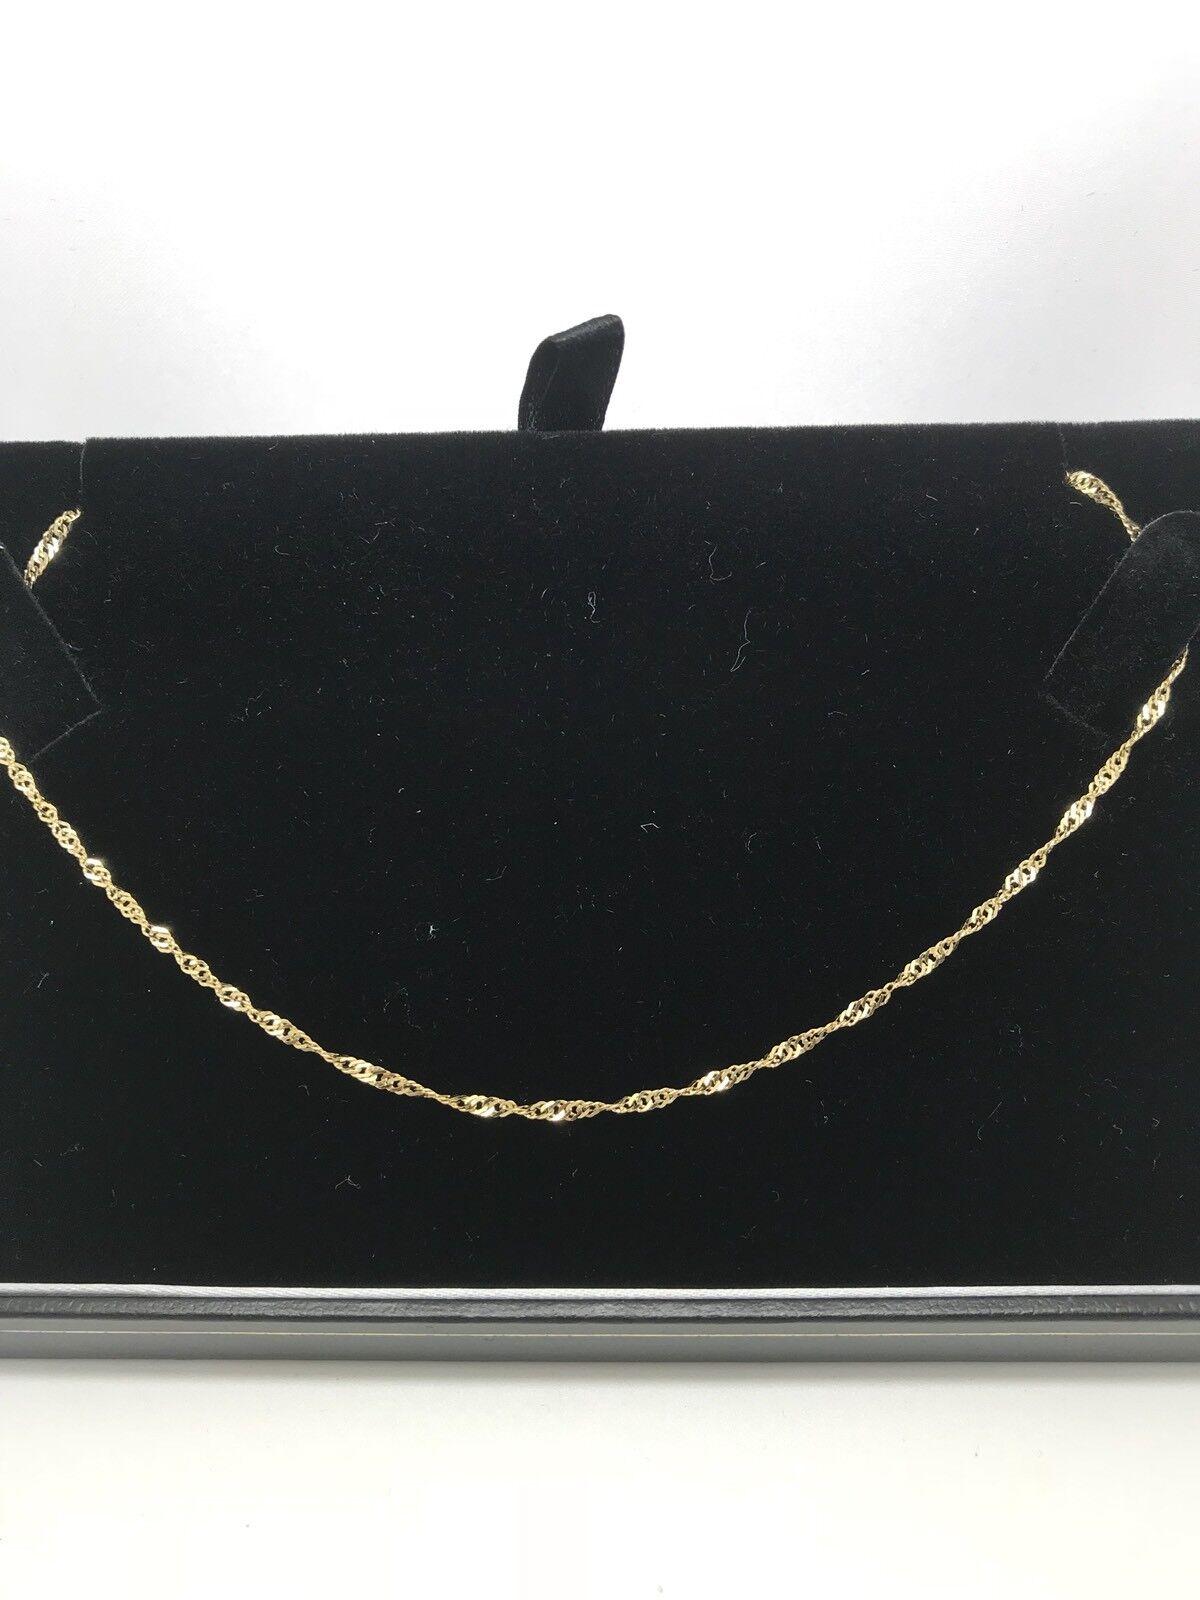 9 KT oro GIALLO 16 in (ca. 40.64 cm) twist twist twist chain 574ab4